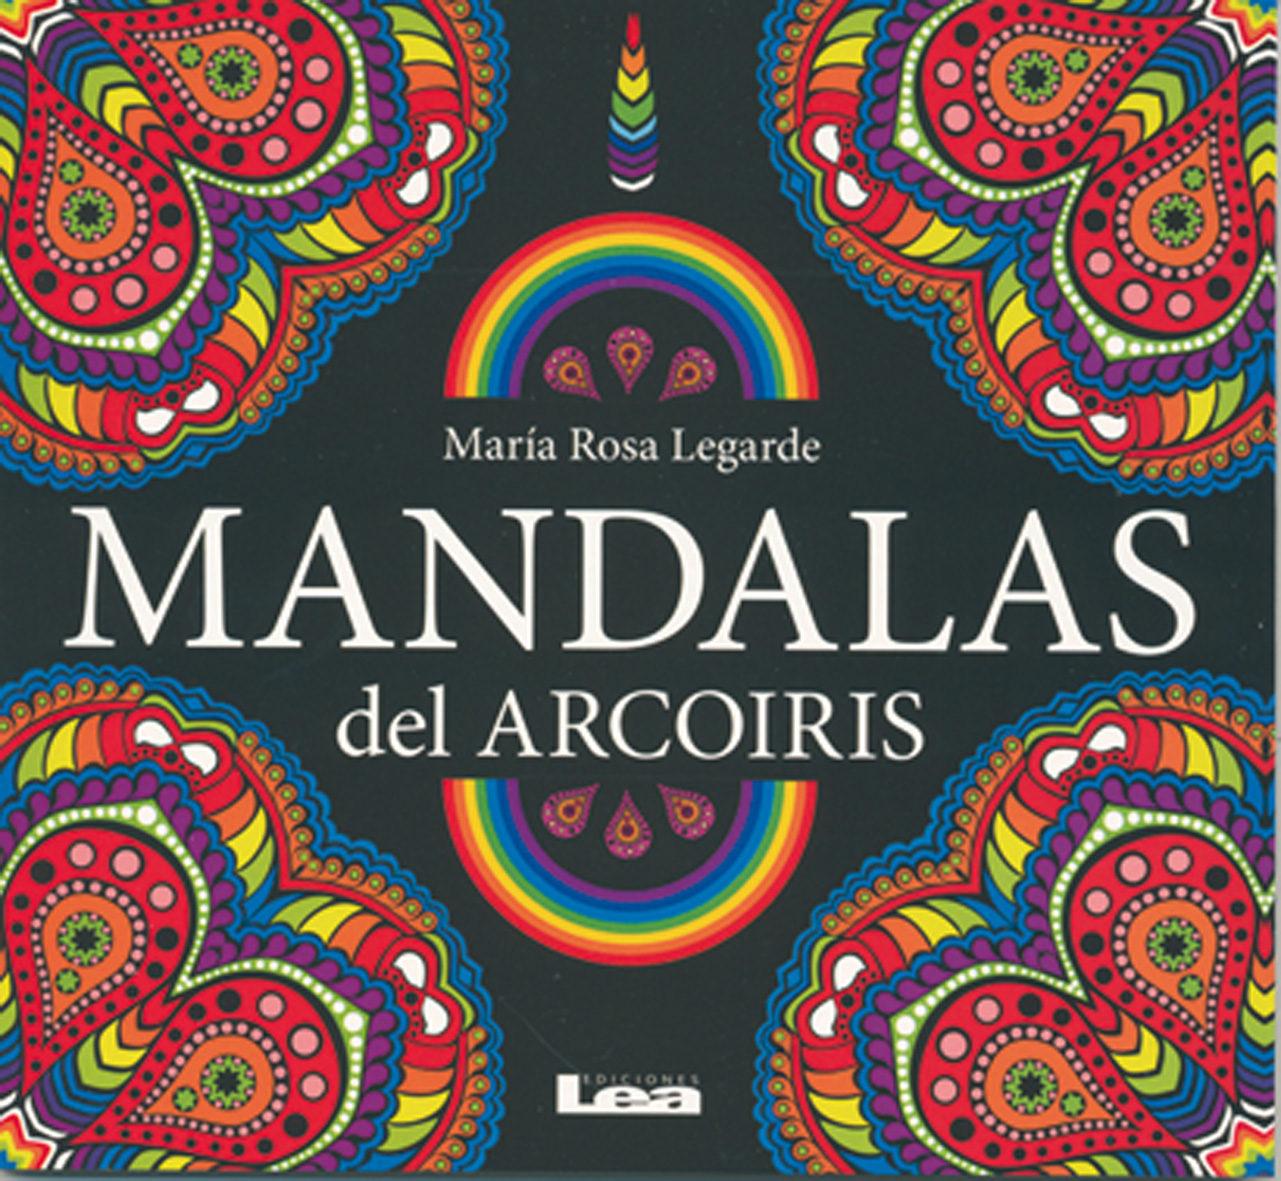 MANDALAS DEL ARCOIRIS | MARIA ROSA LEGARDE | Comprar libro 9789876348805